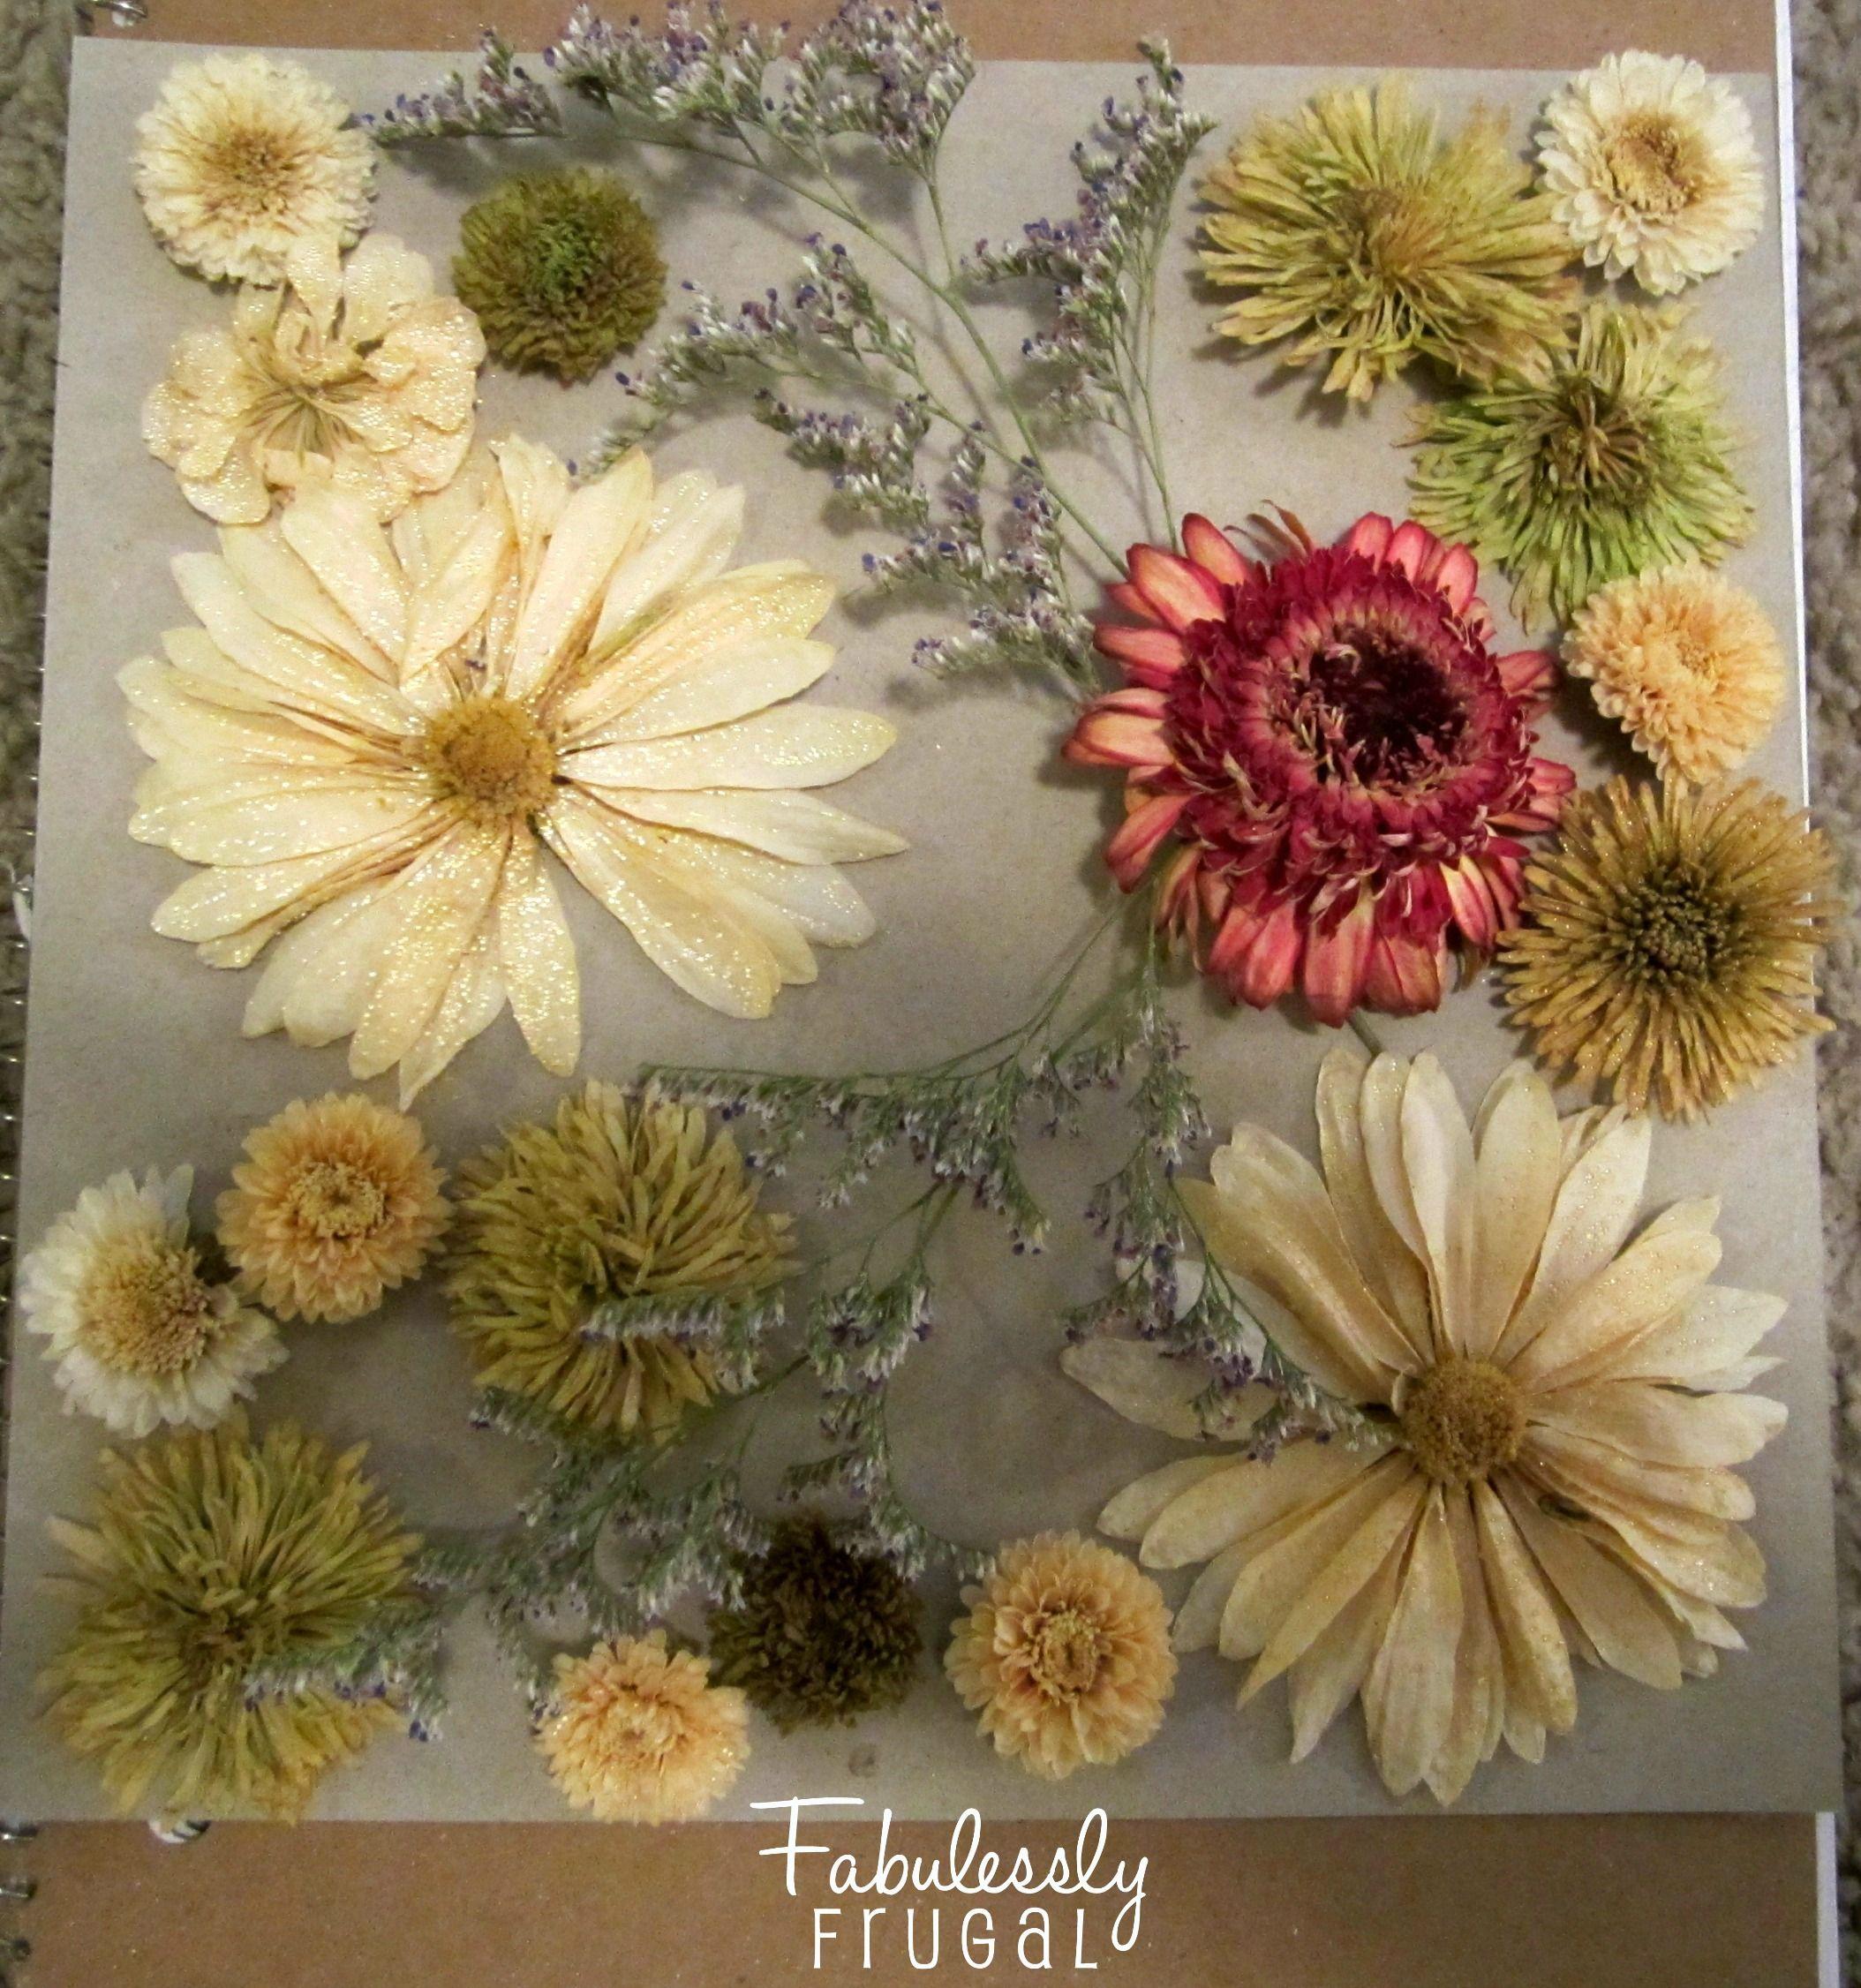 How to scrapbook flowers - Diy Dried Flowers Shadow Box